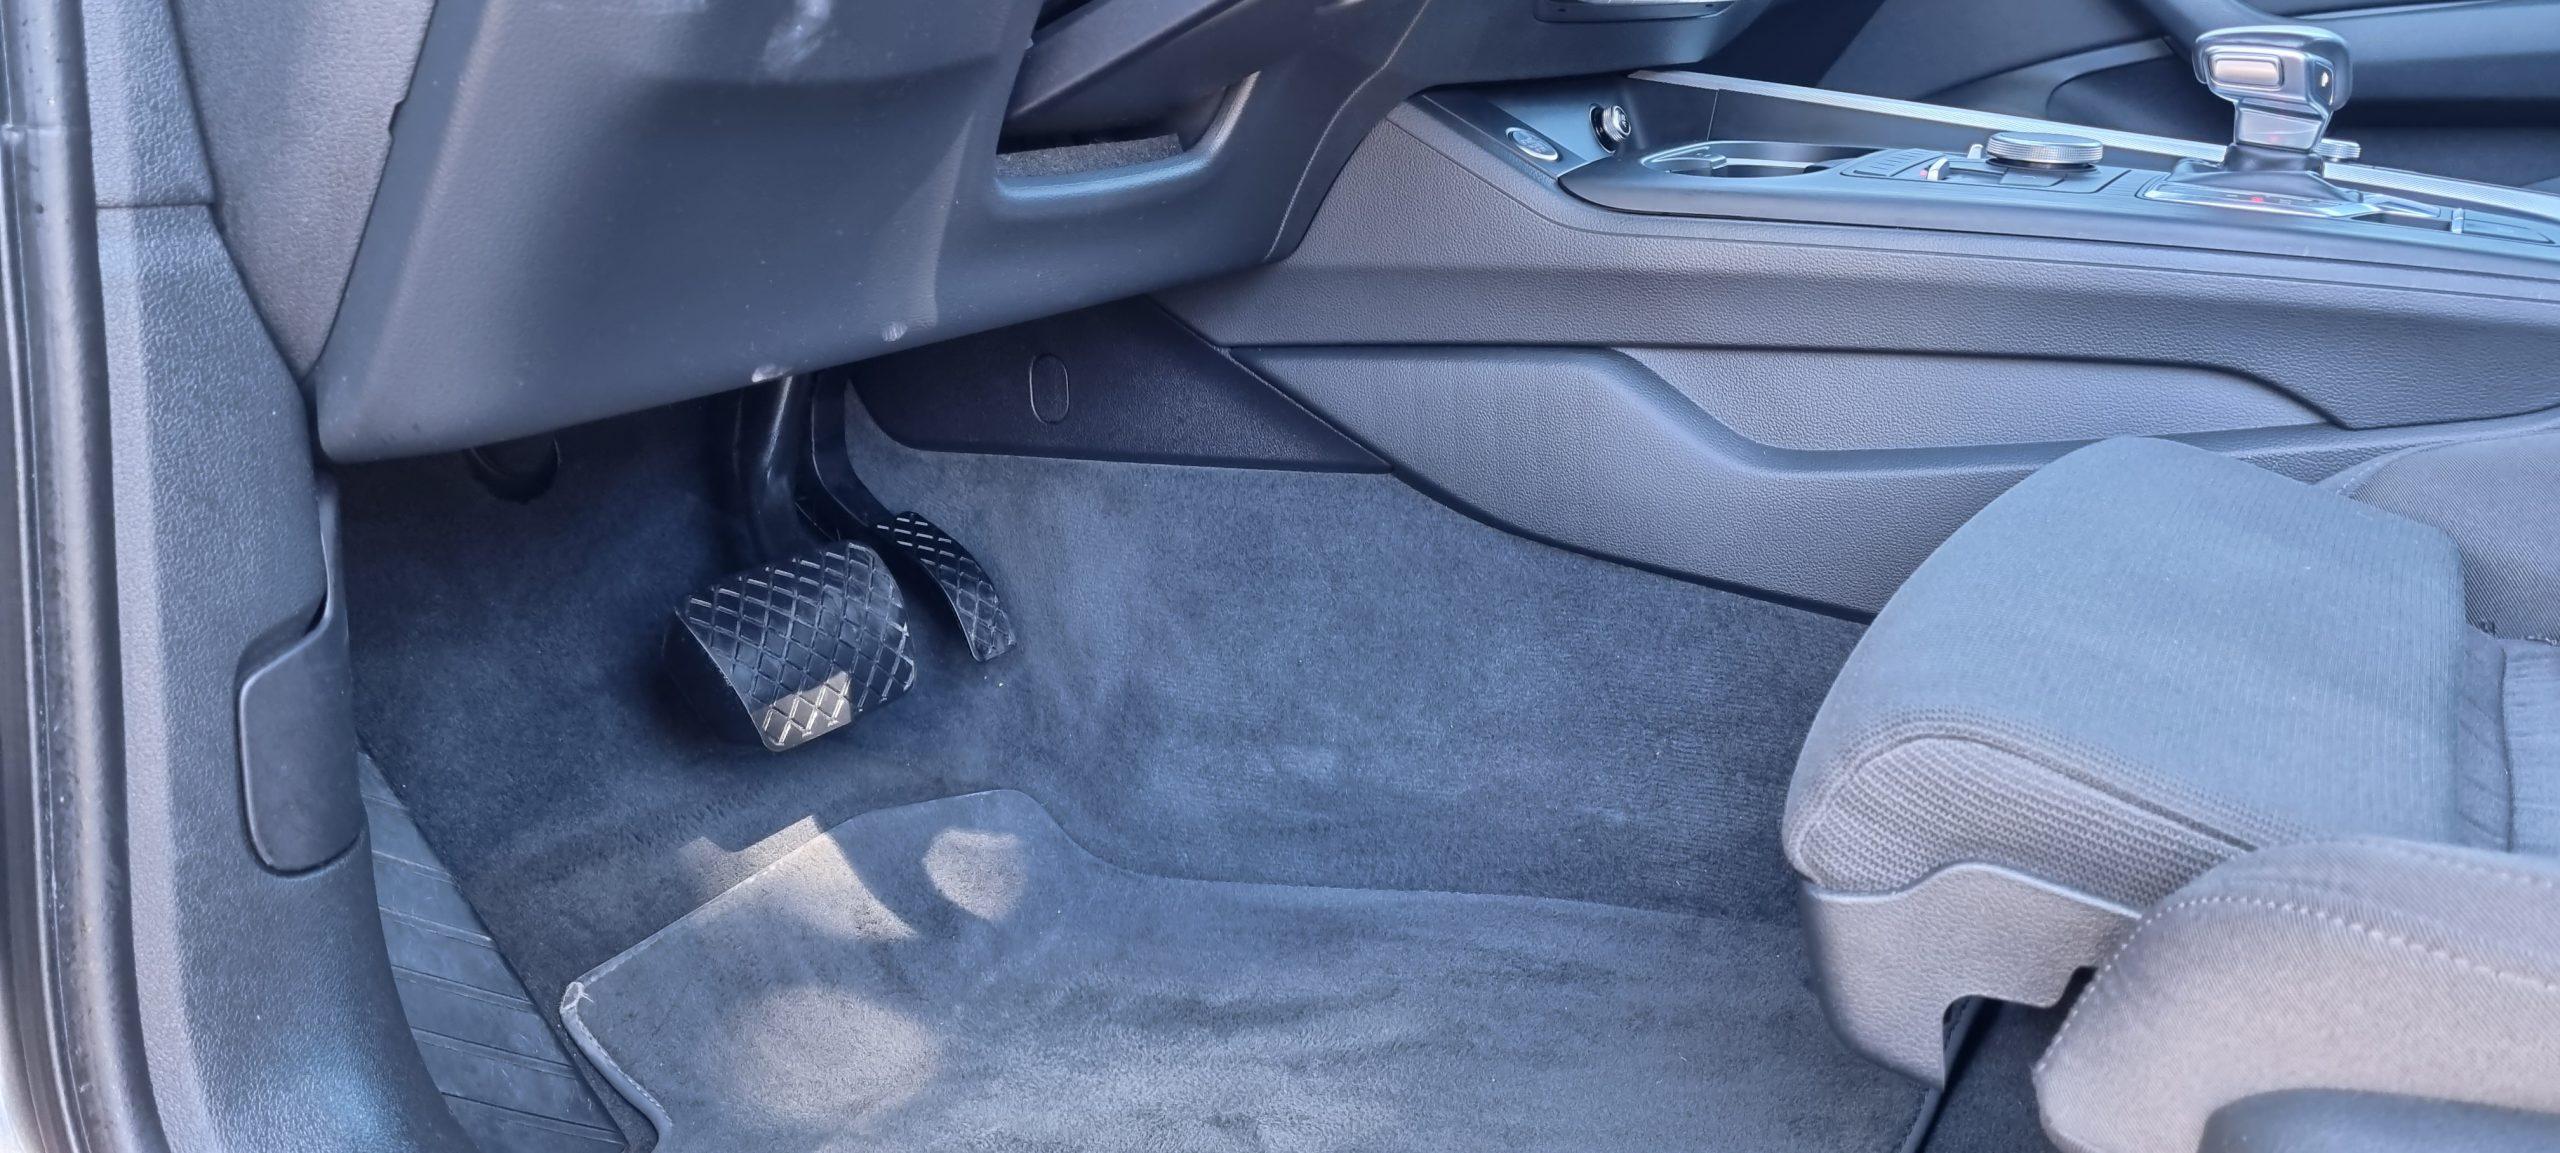 Audi A4 Avant 2.0 Tdi S-Tronic S-Line Edition